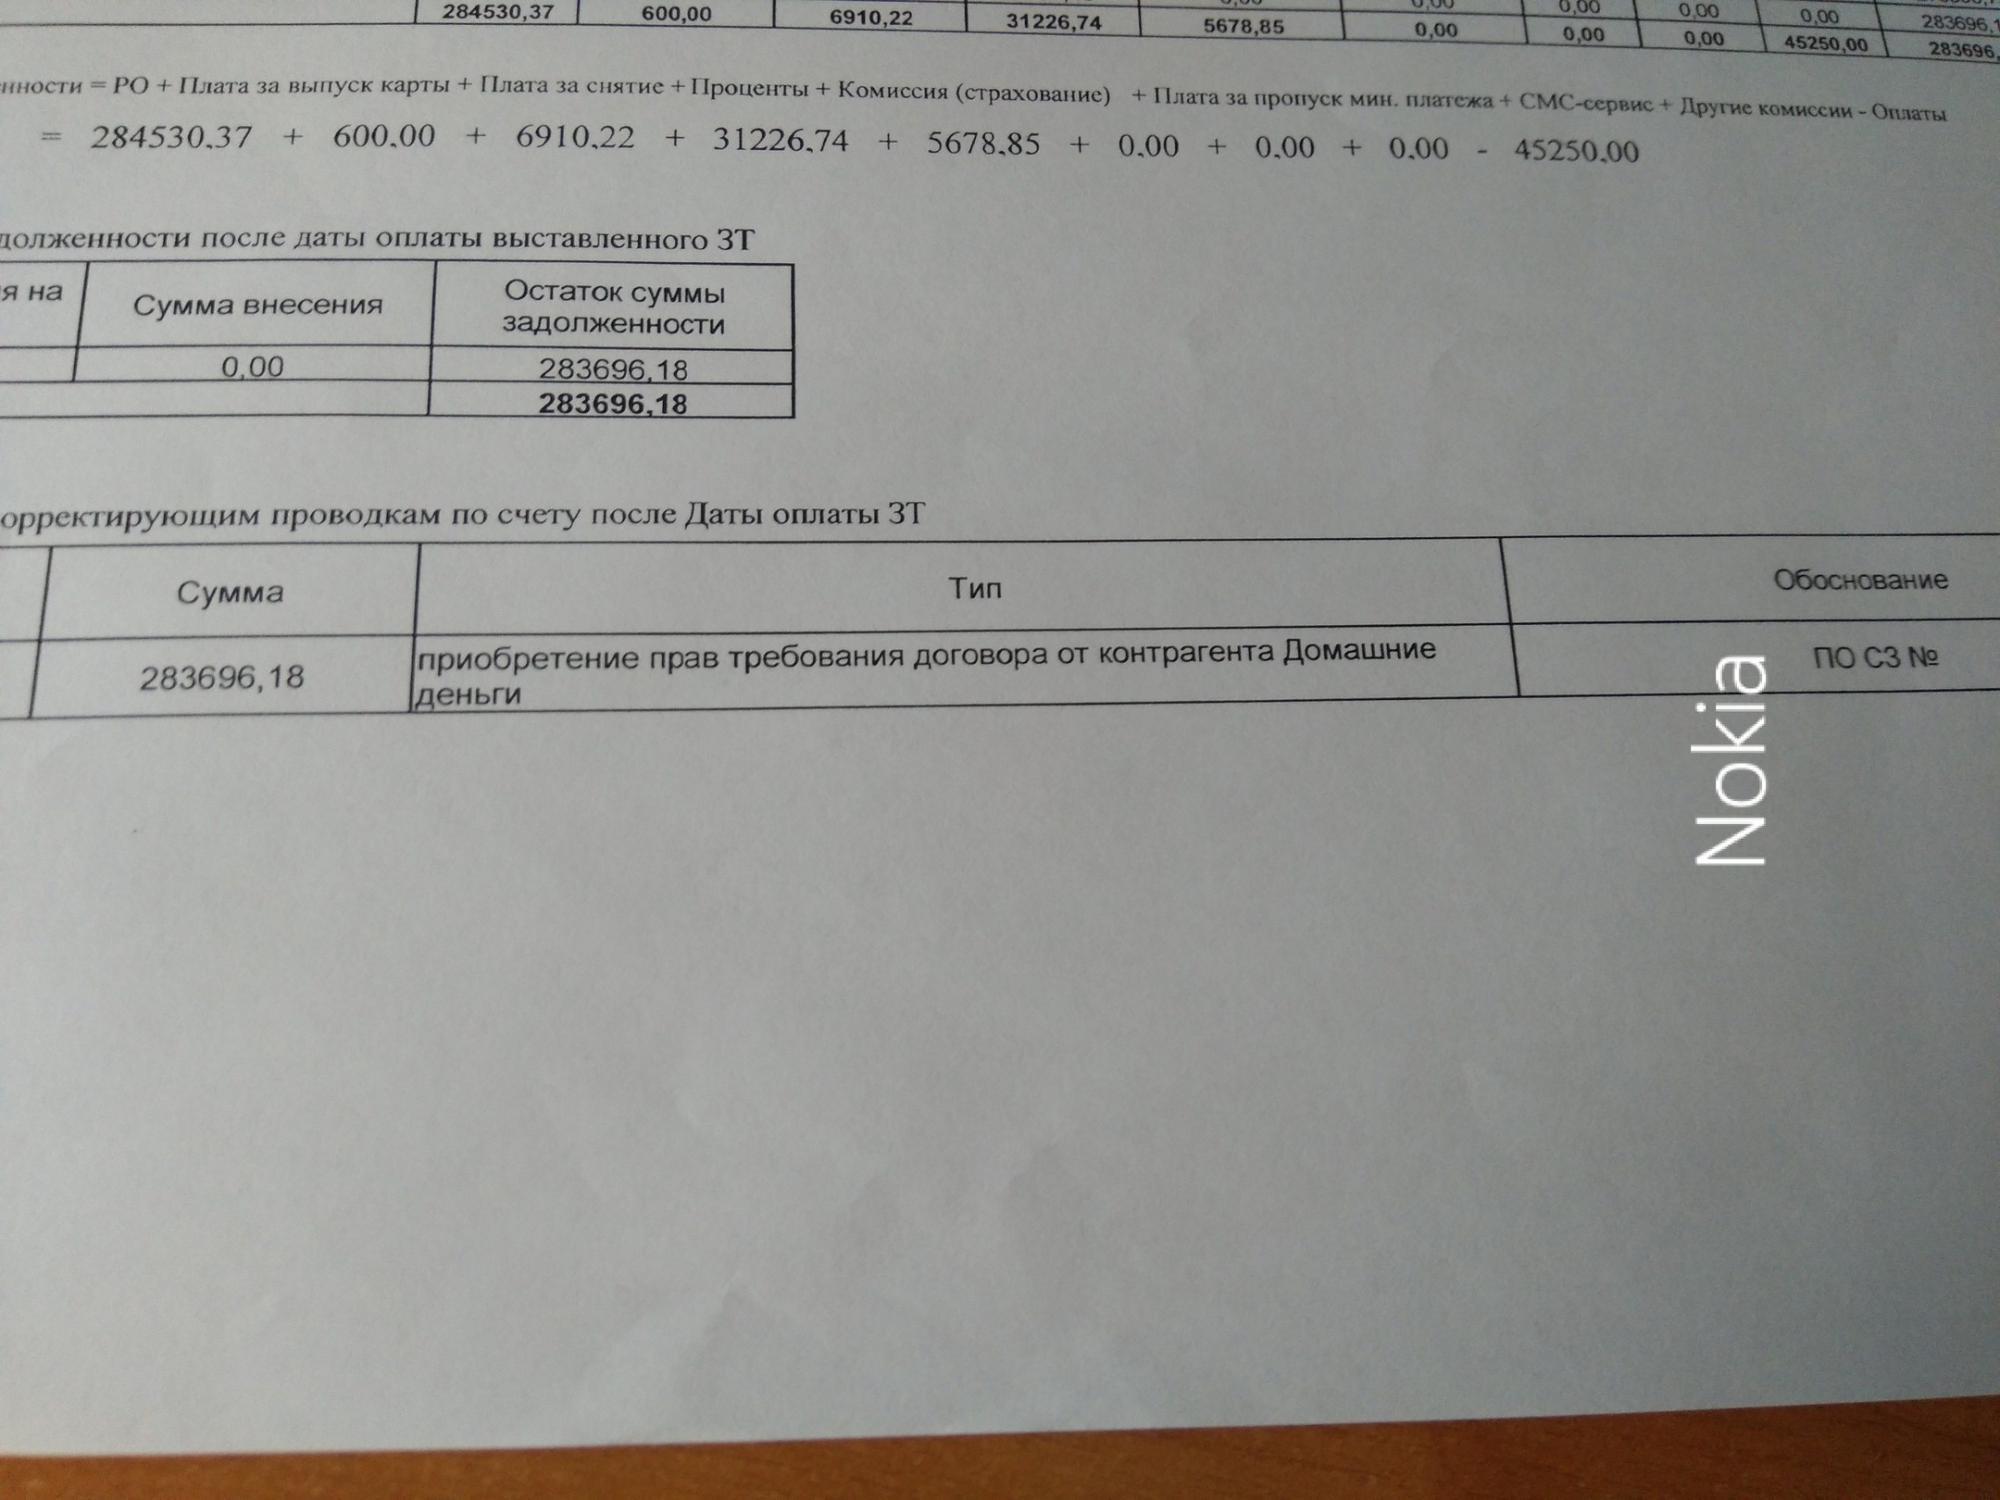 e3t68rLXVk0.jpg